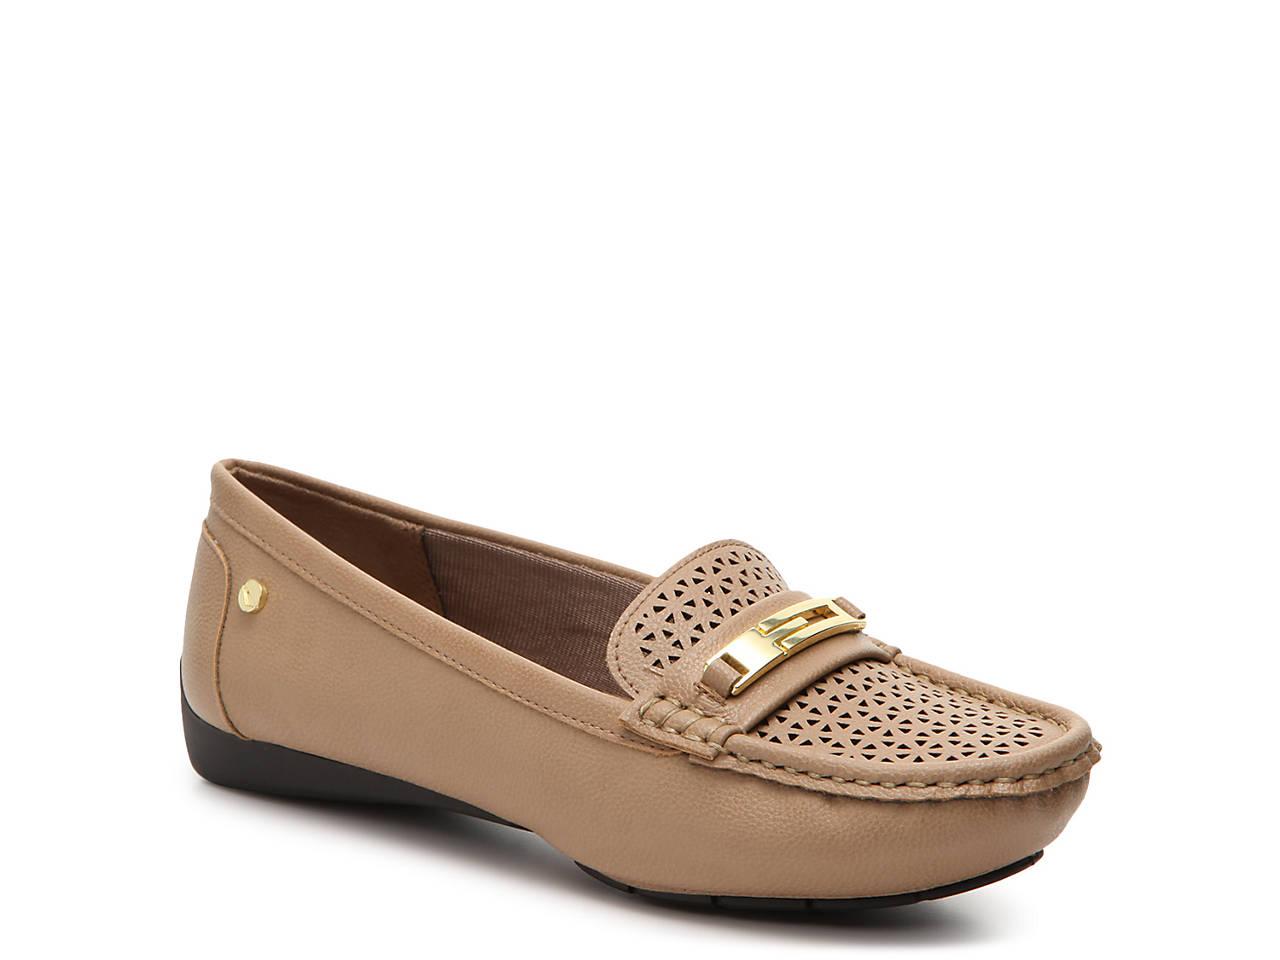 2a0a4c48b02 Viva Loafer